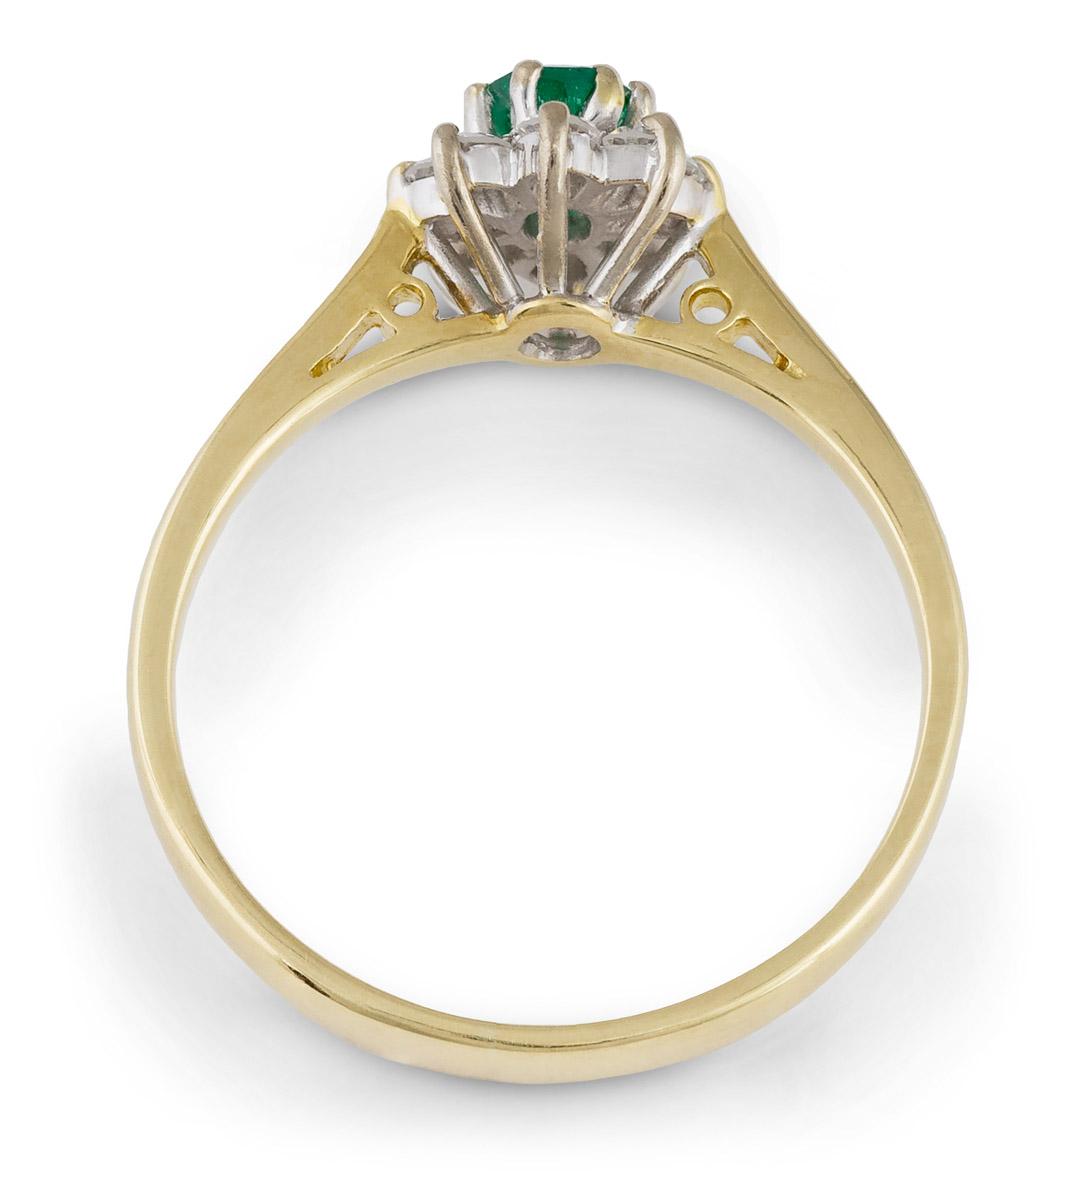 Vintage Filigree Emerald Ring With Diamond Halo - Top